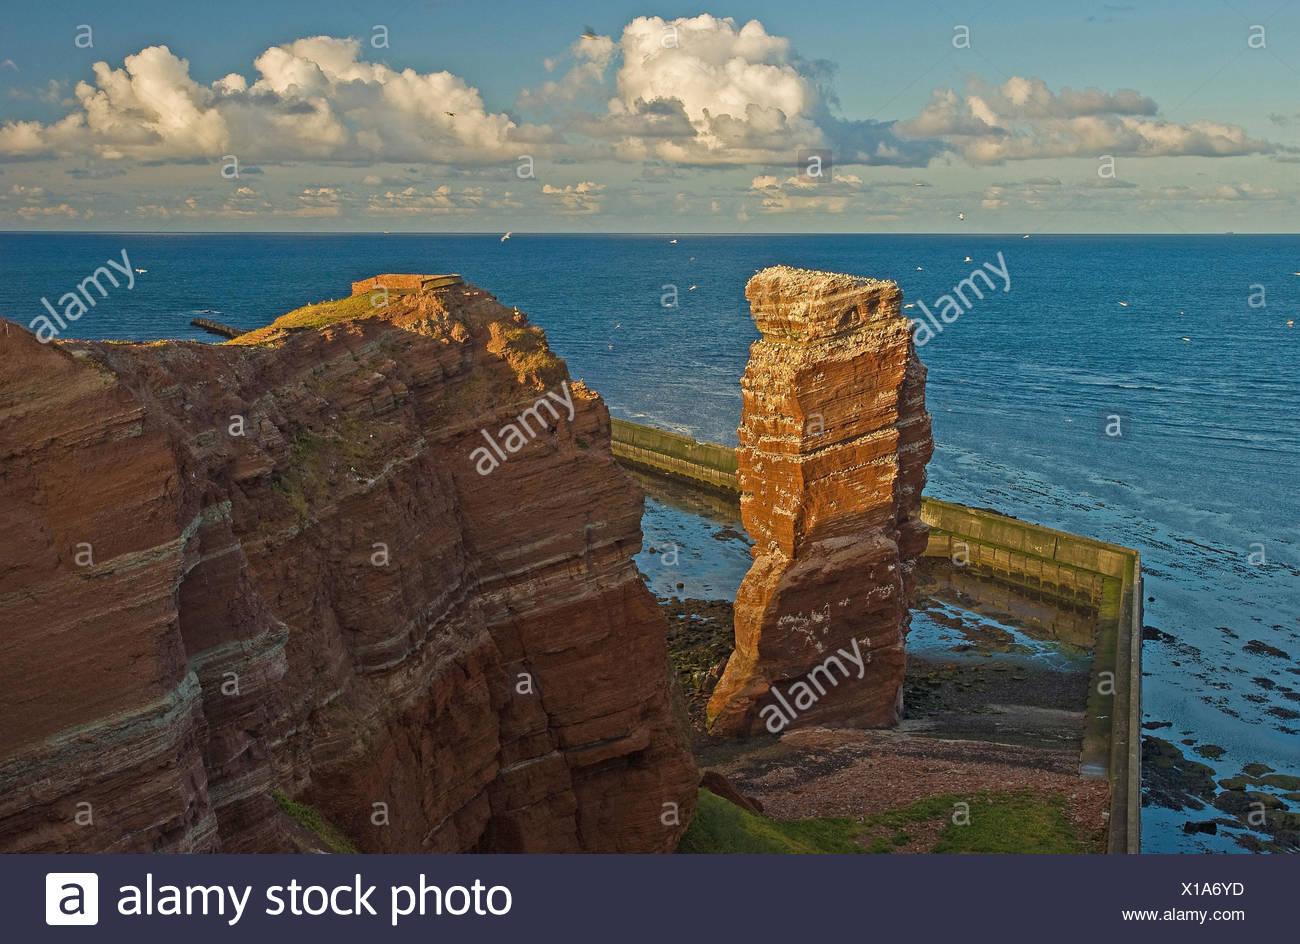 Germany, Schleswig-Holstein, Helgoland, rock spire Lange Anna, bird colony, sea view, - Stock Image